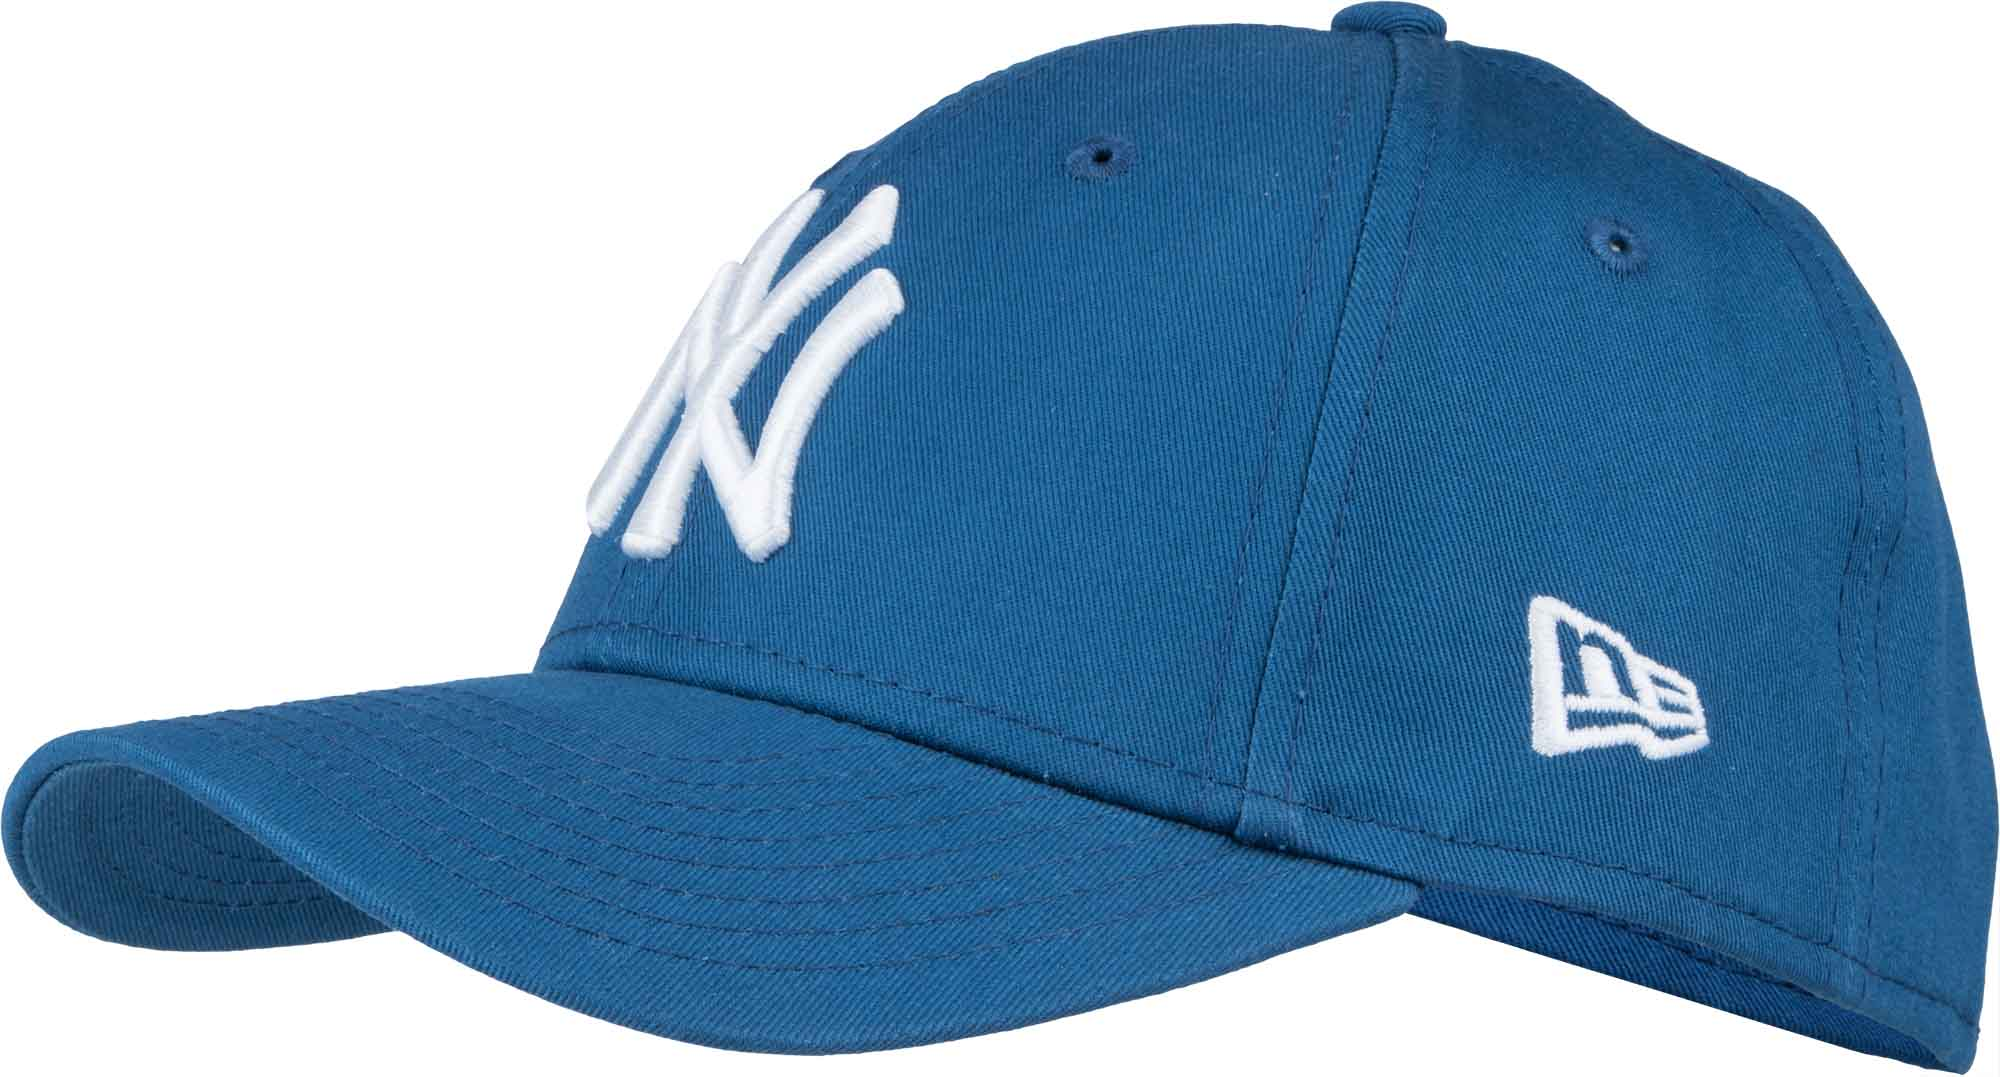 5c7866b4307 New Era 9FORTY K MLB NEW YORK YANKEES